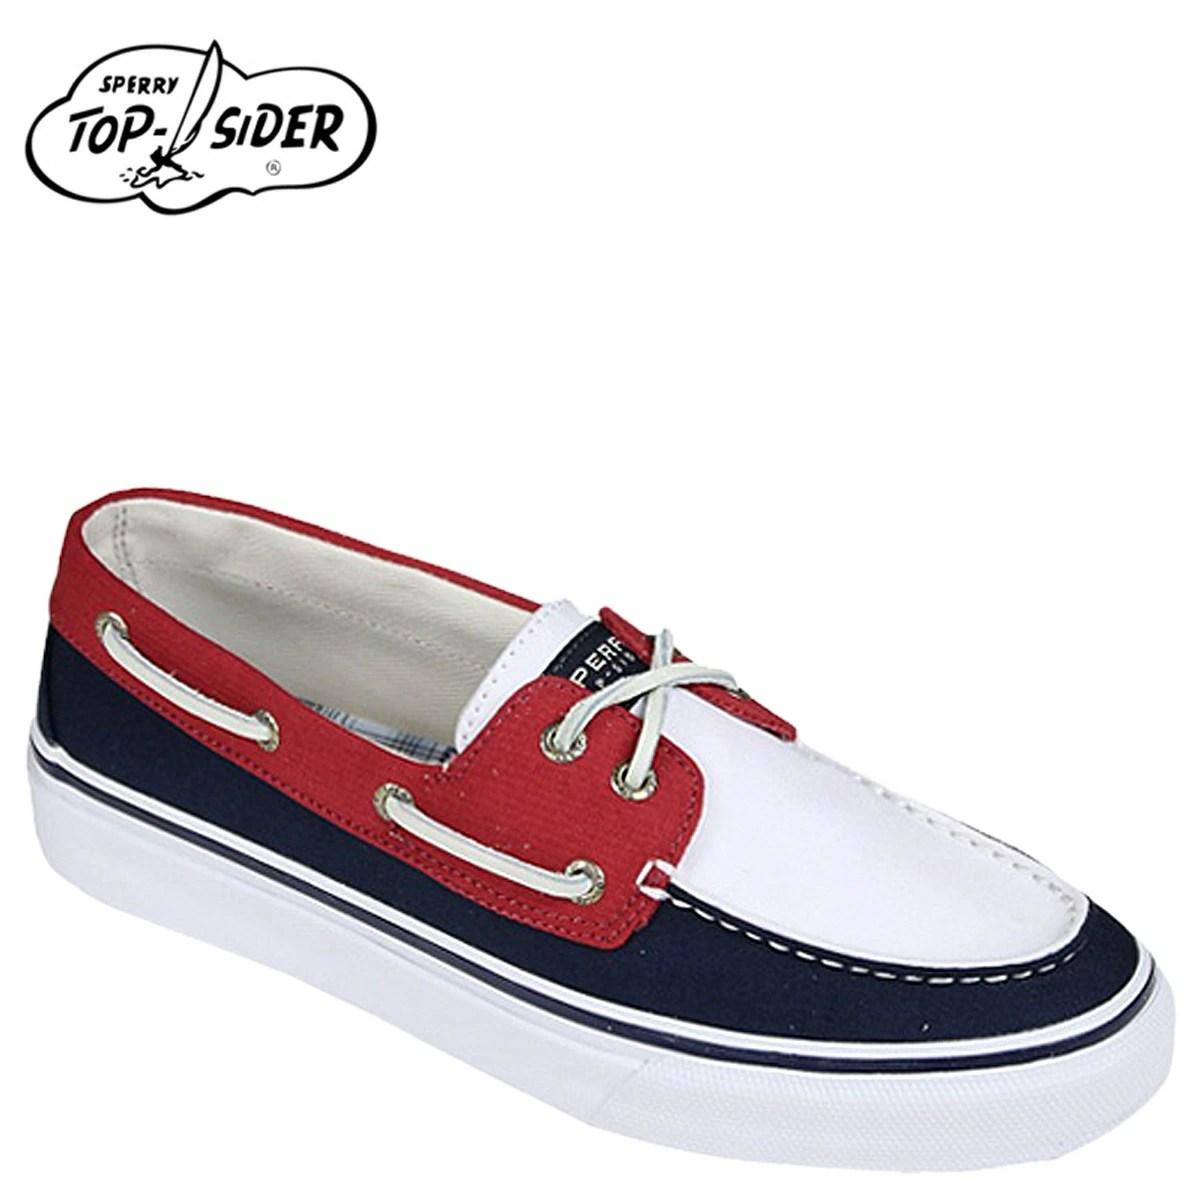 SneaK Online Shop: [賣出] 斯佩里頂部斯佩里 TOPSIDER 甲板鞋海軍紅色水泥 0565622 巴哈馬船鞋 M 明智帆布男士 | 日本 ...